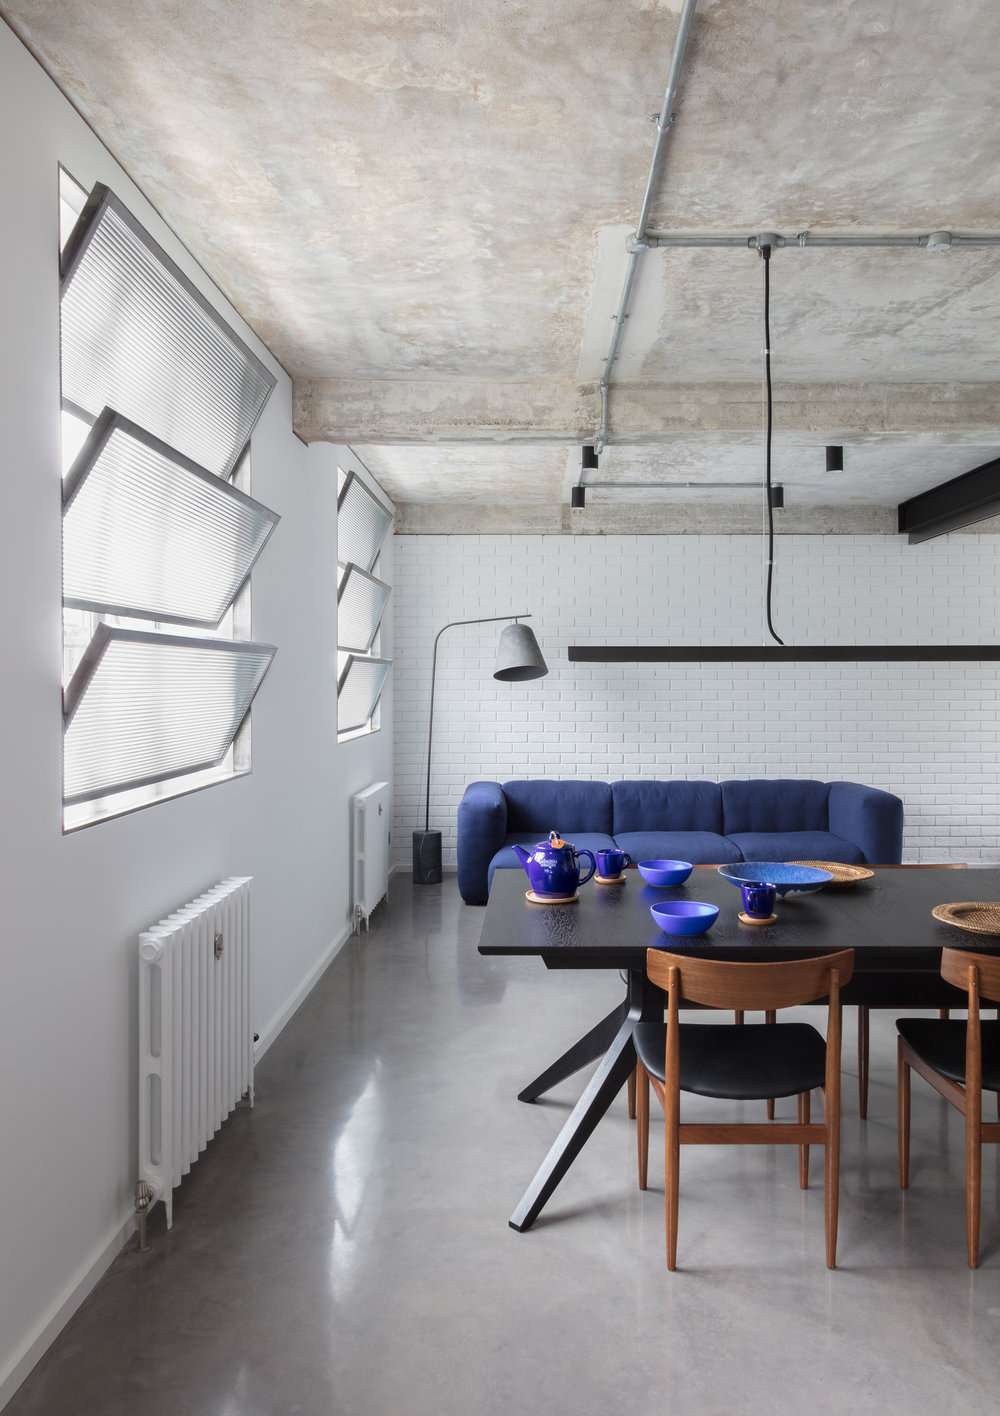 Union-Wharf-Islington-London-Exposed-Concrete-Ceiling-Shutters-Dining-Hay-Sofa-Interior.jpg